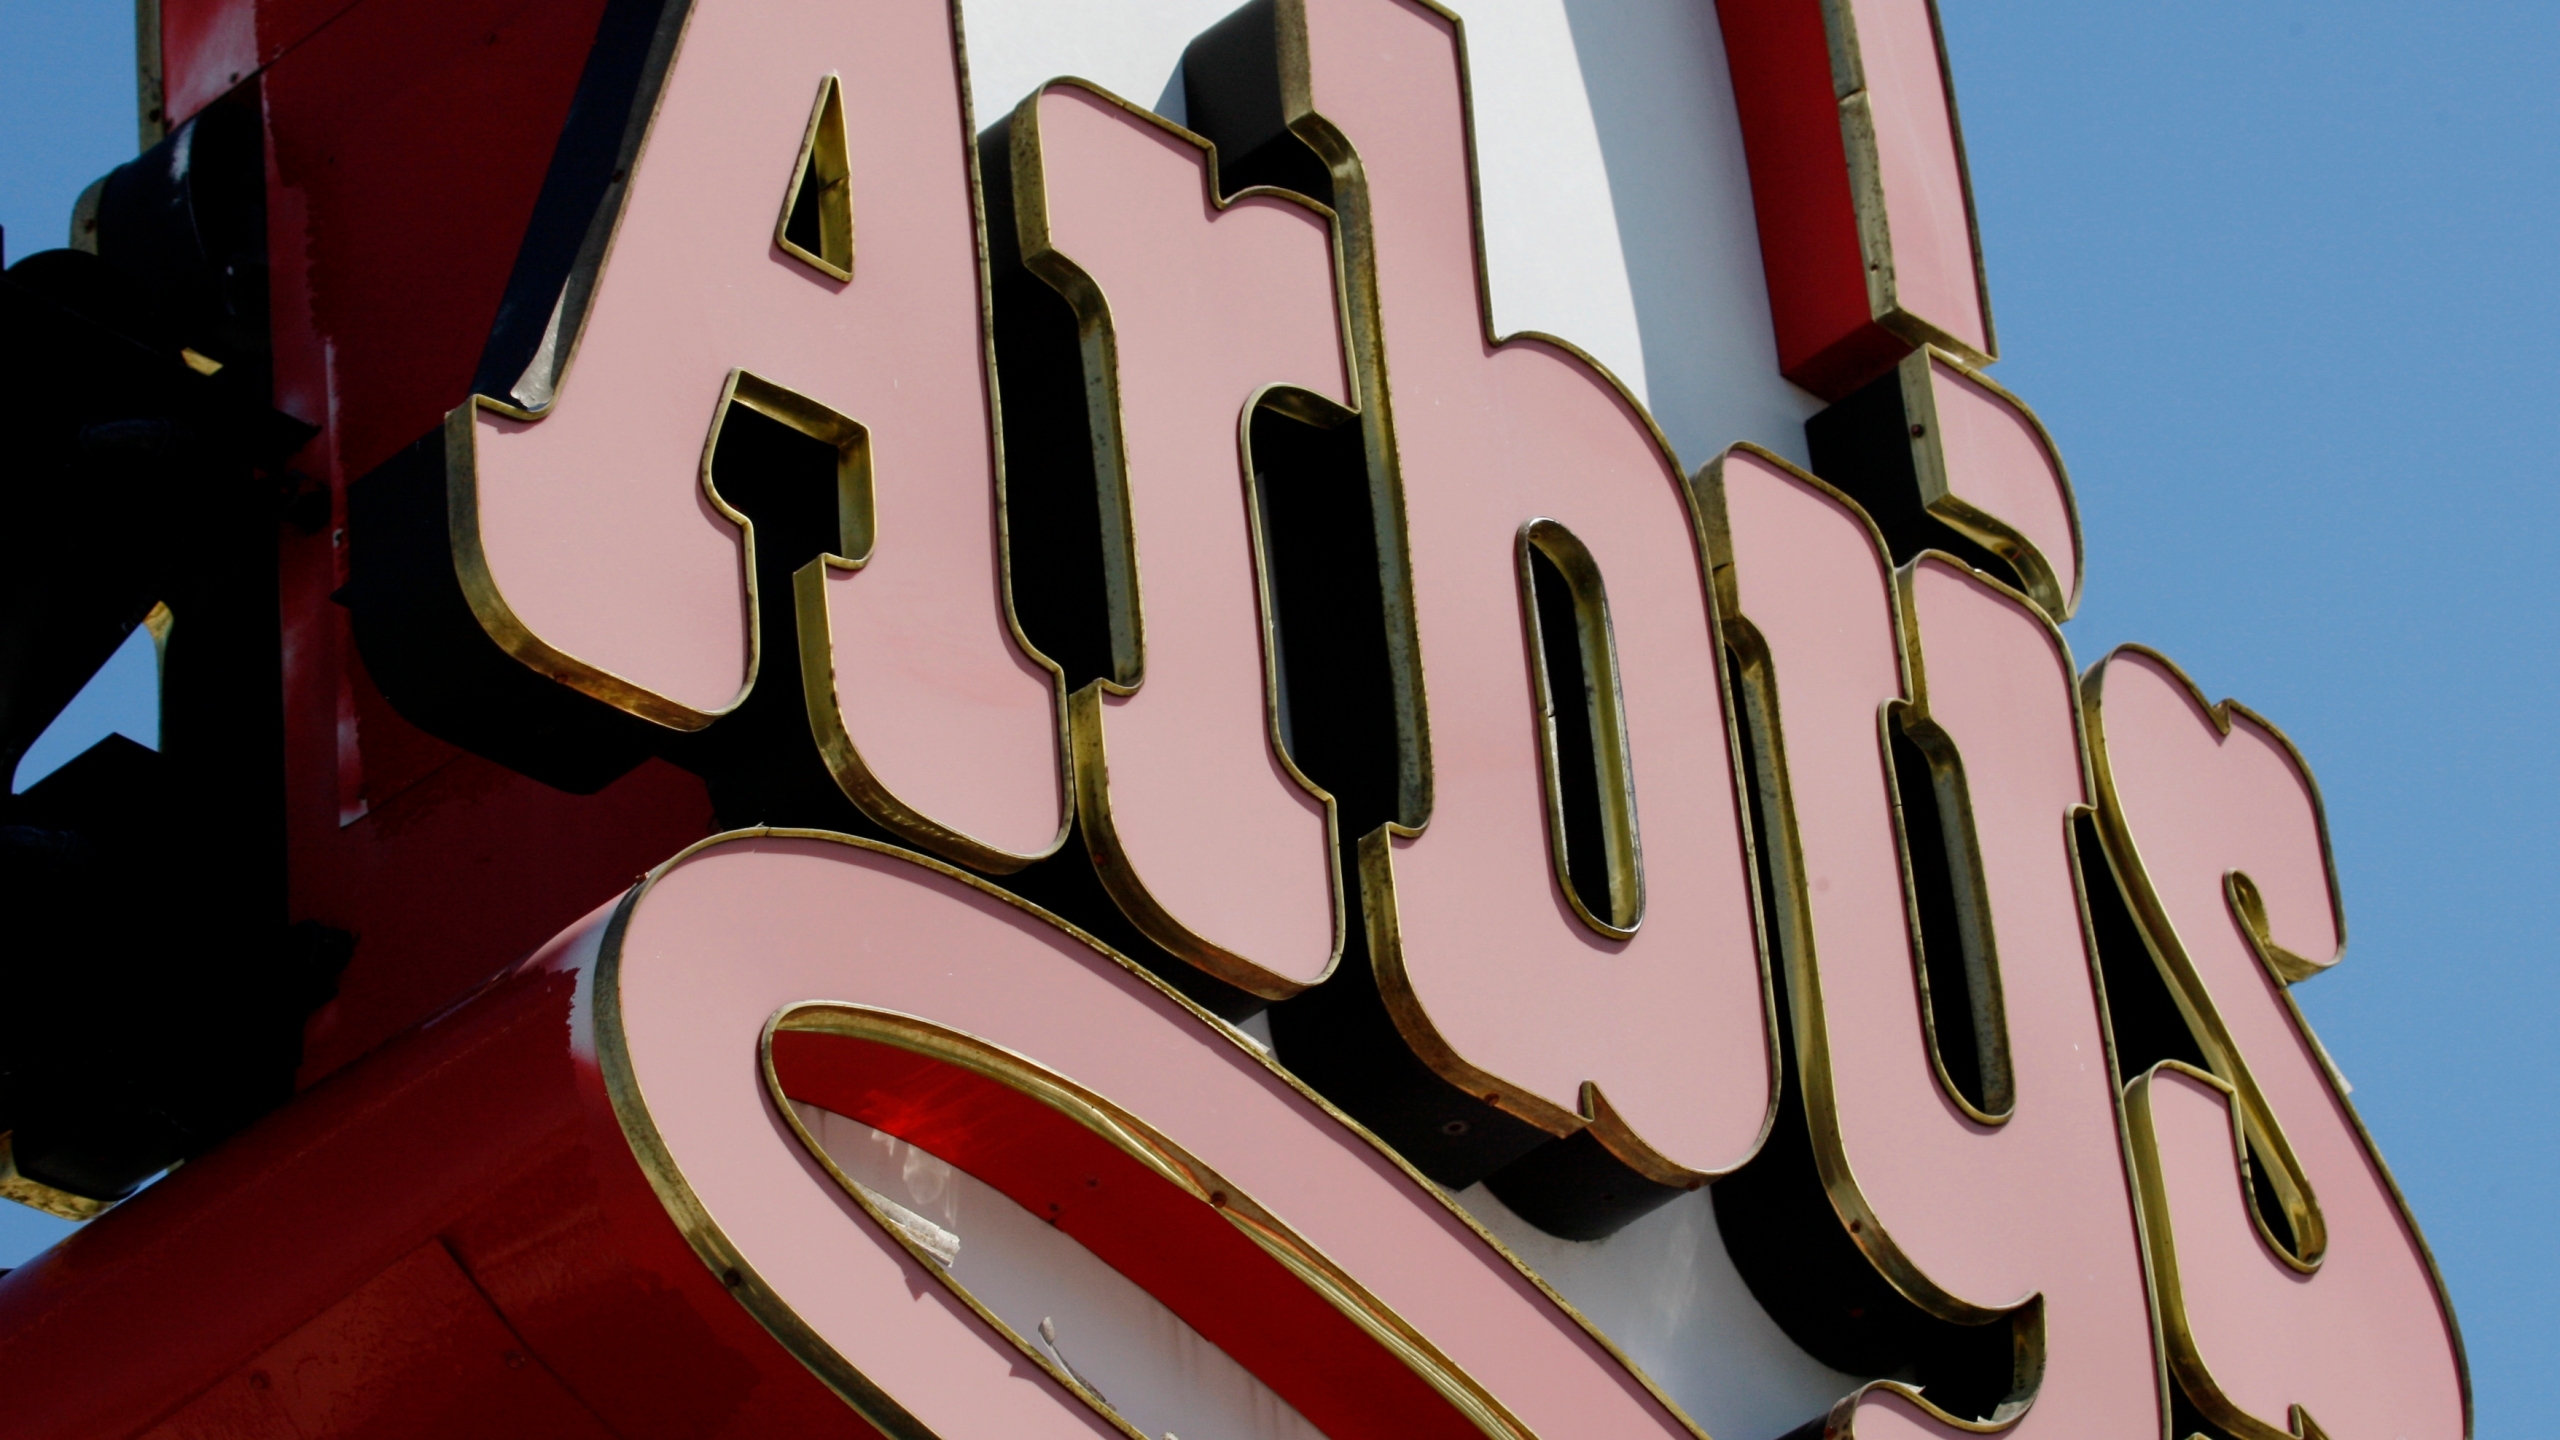 Arby's_216251